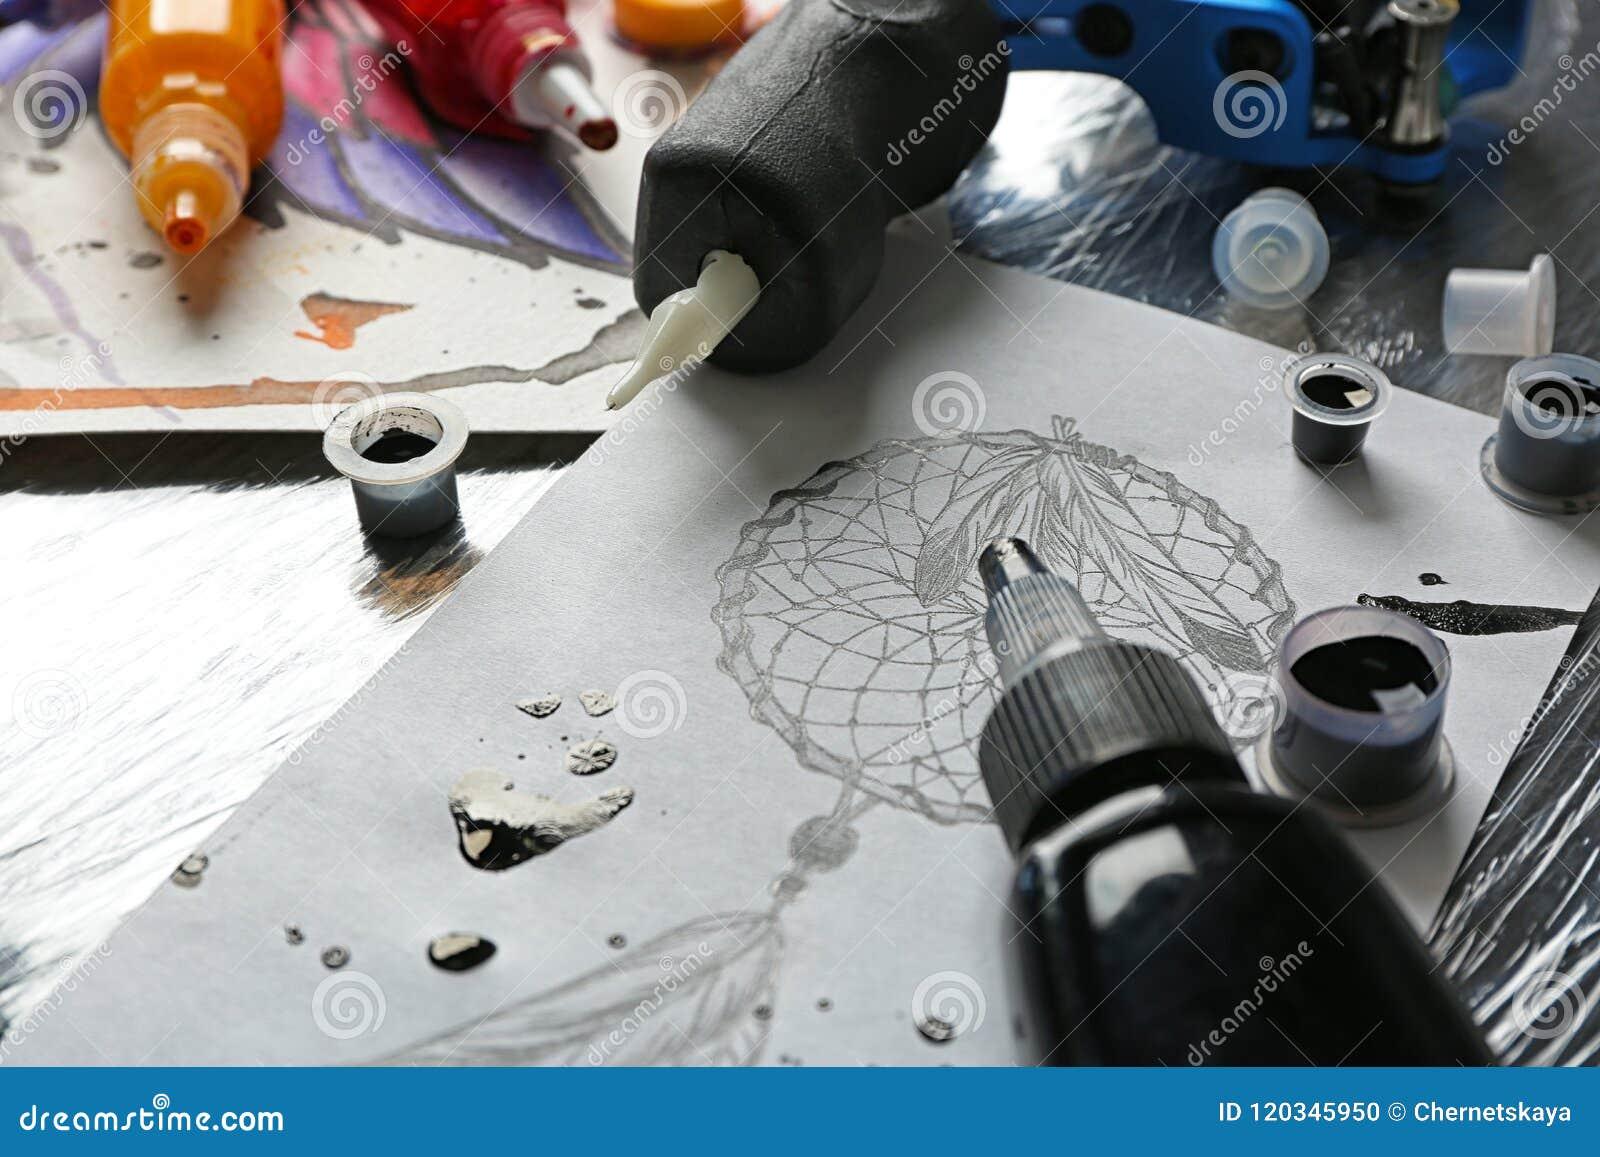 Tattoo machine, sketch and supplies